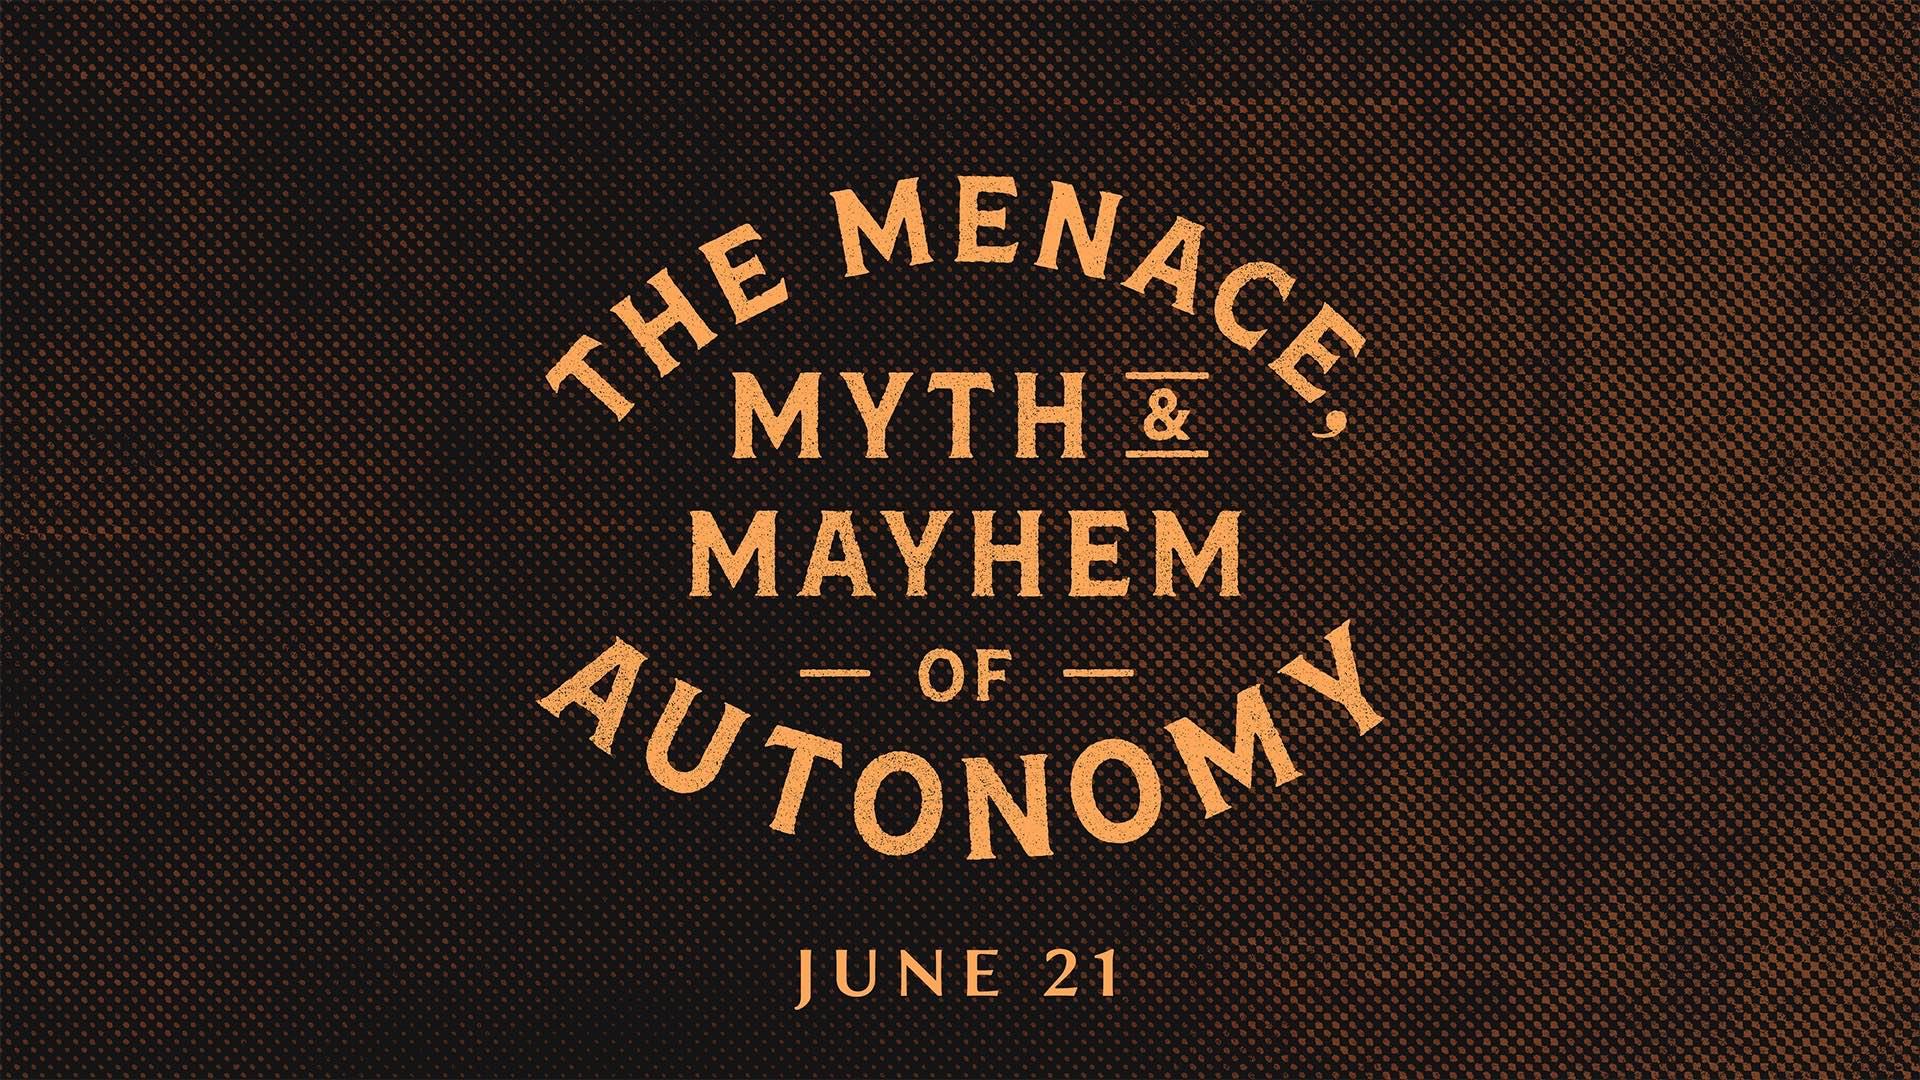 The Menace, Myth & Mayhem of Autonomy